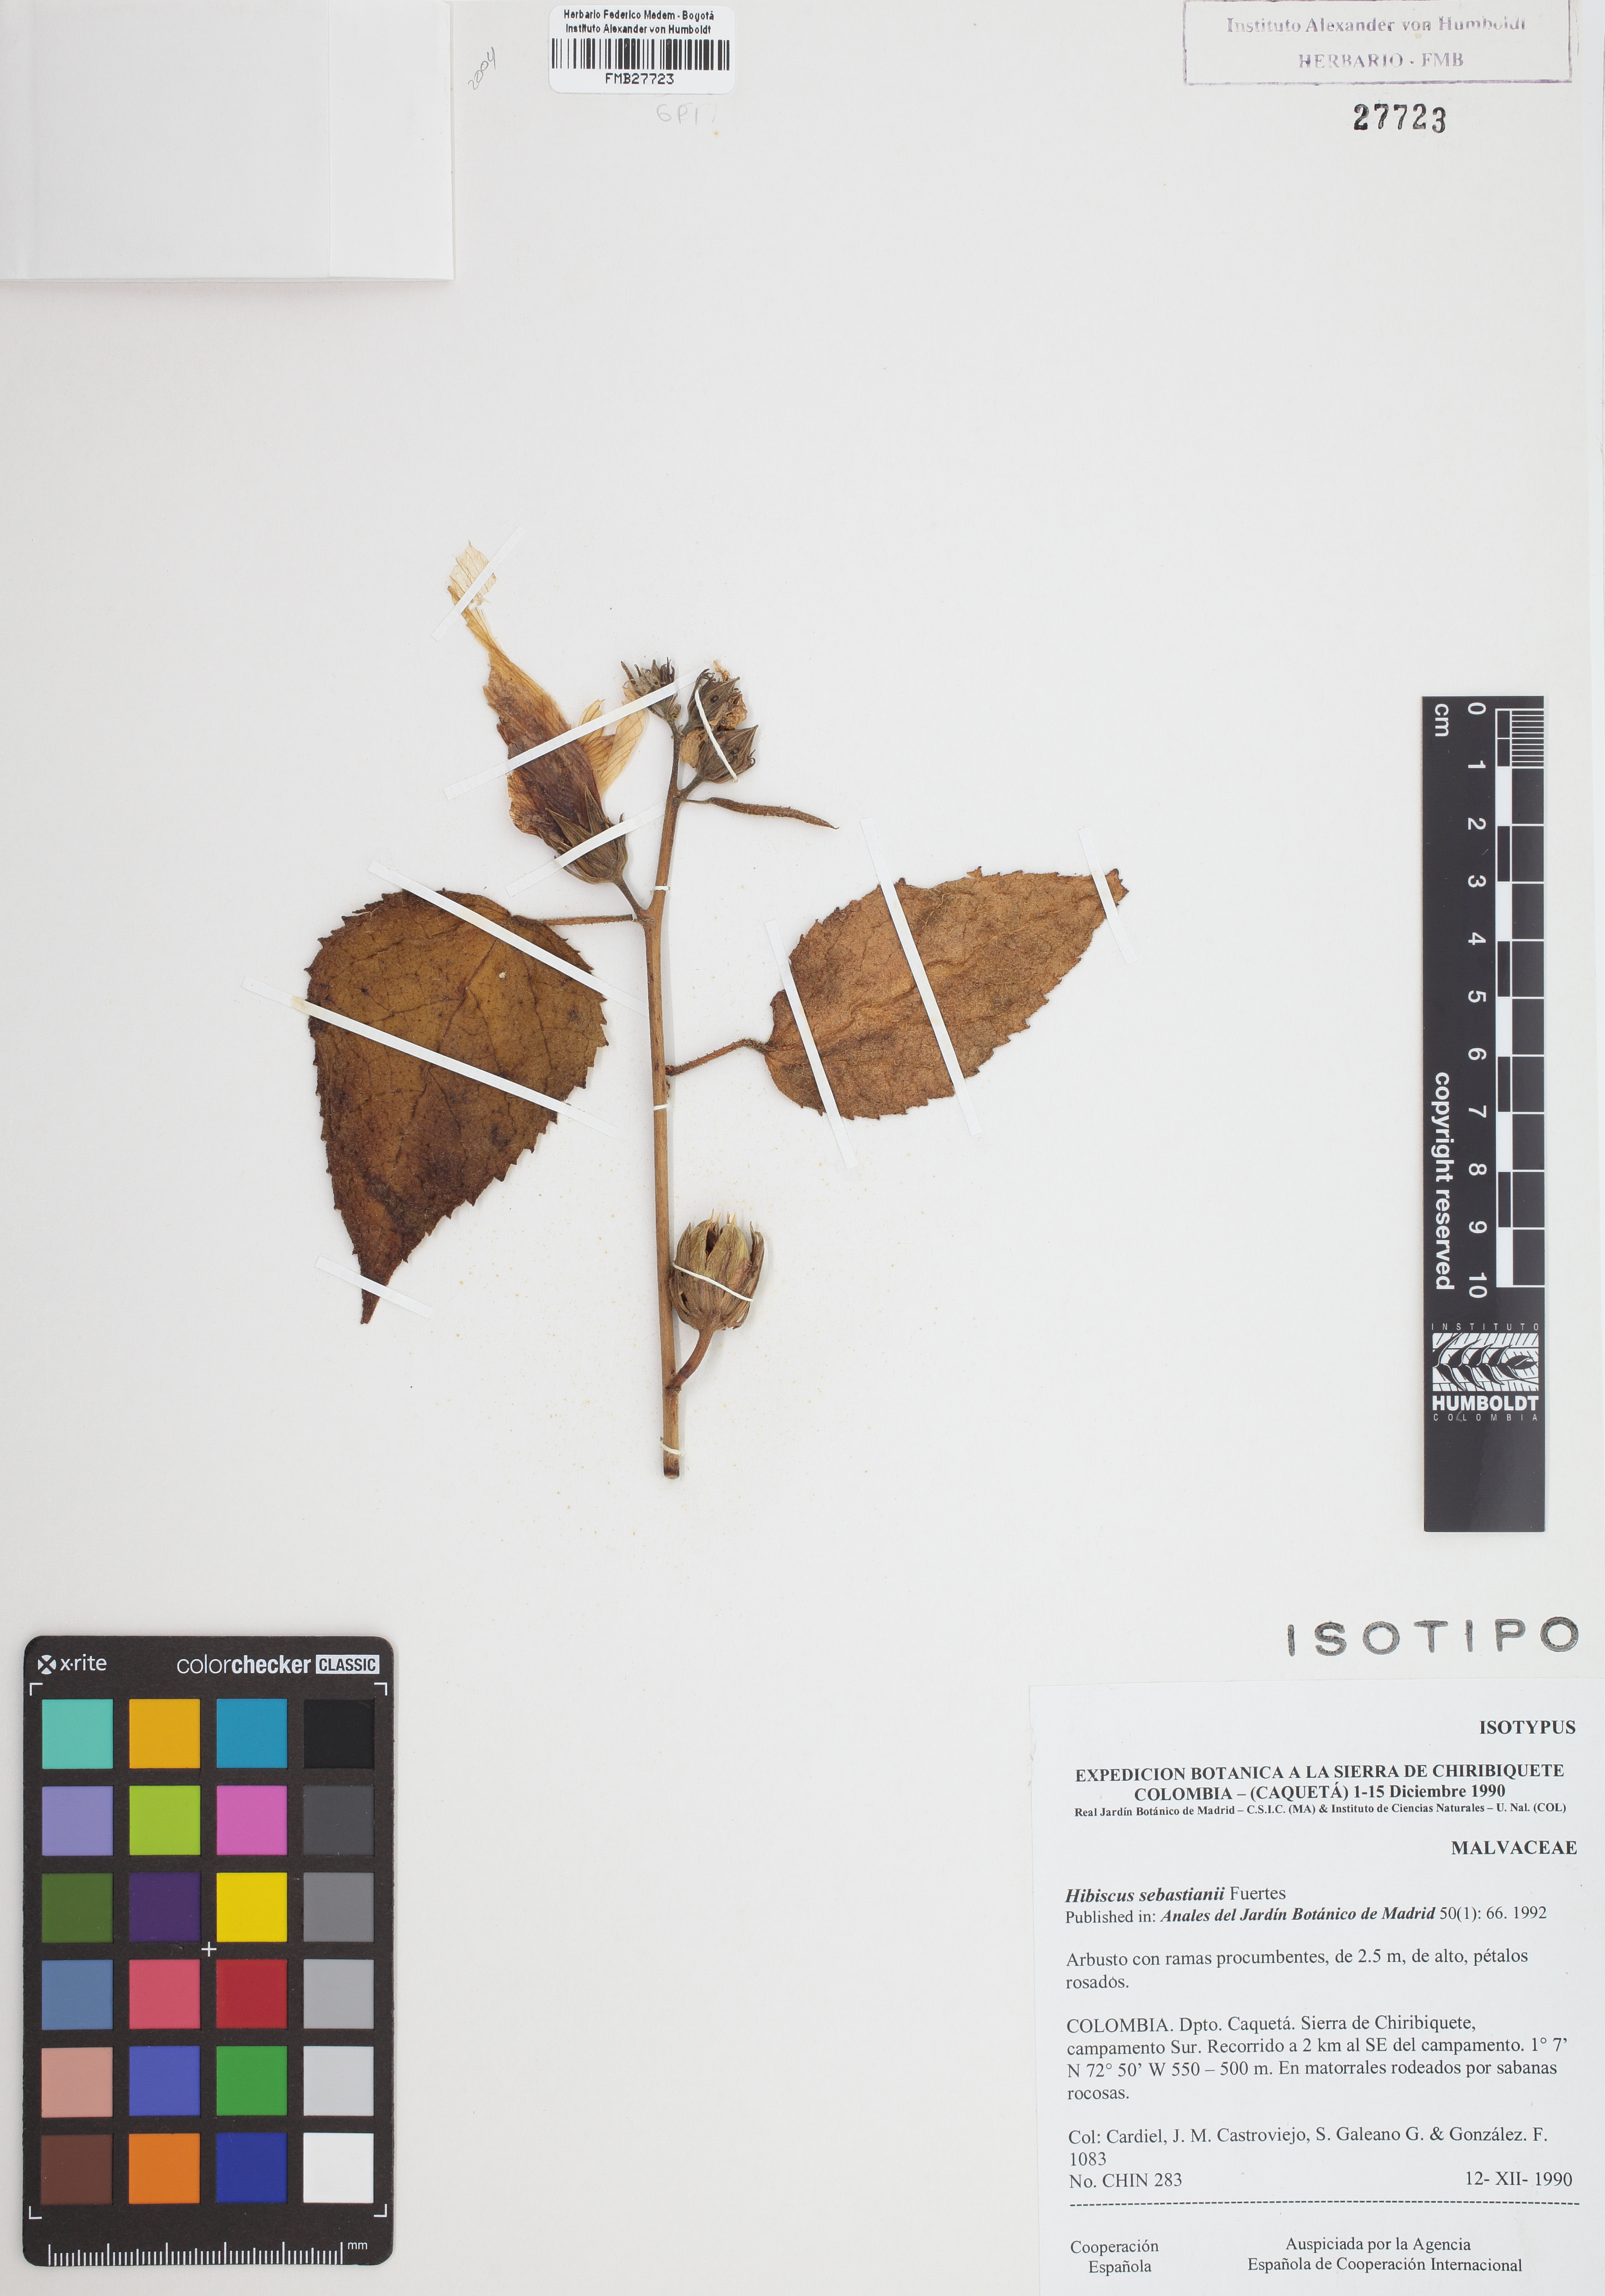 Isotipo de <em>Hibiscus sebastianii</em>, FMB-27723, Fotografía por Robles A.